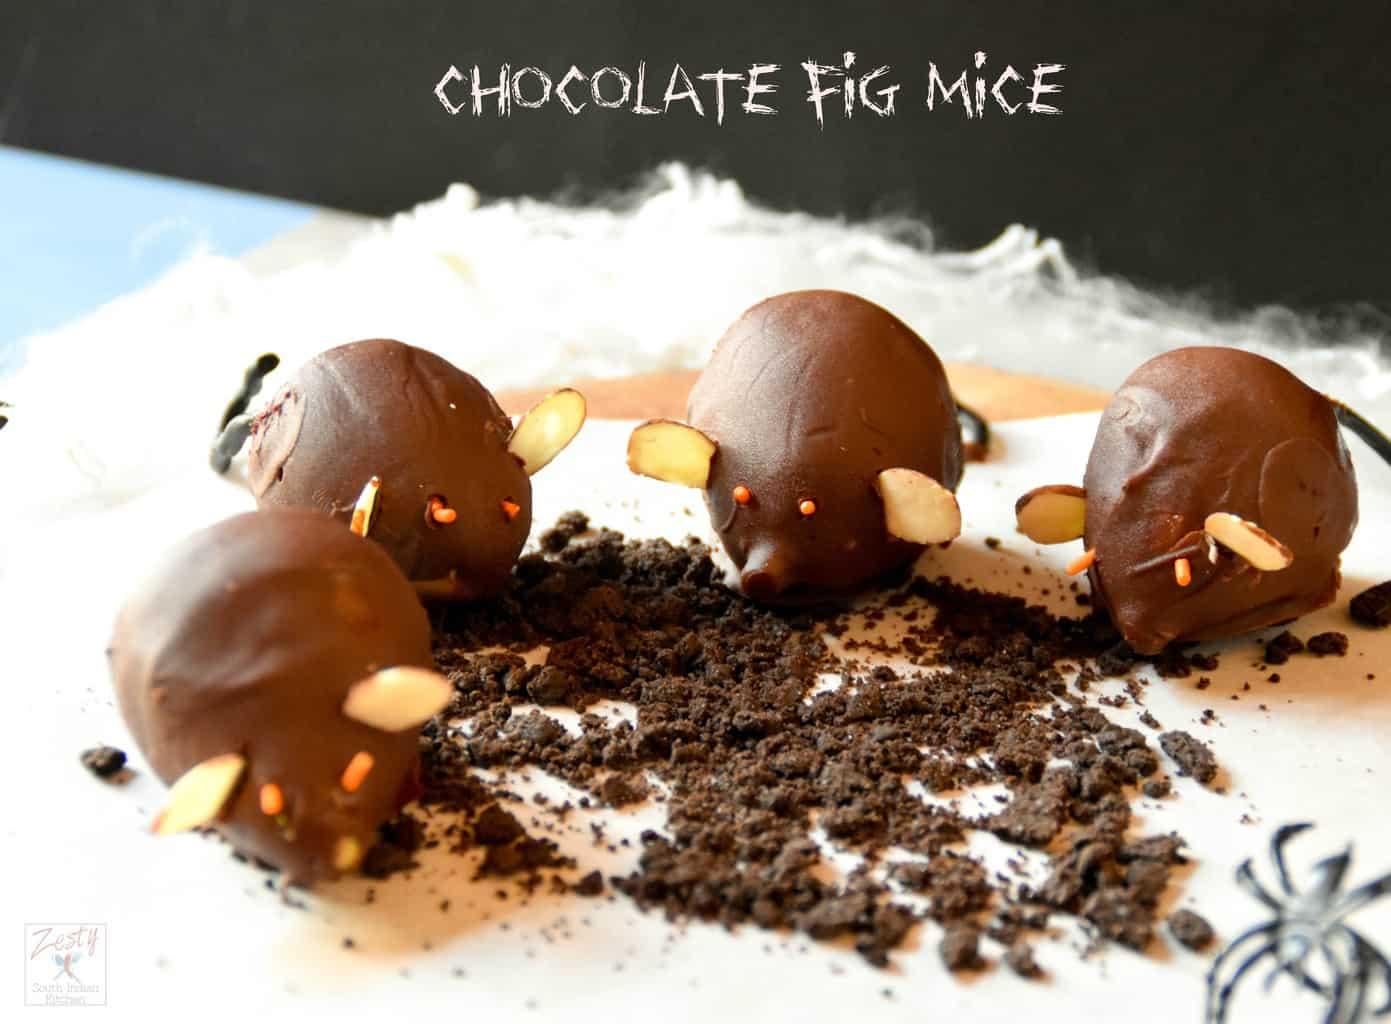 "<img src=""https://cdn.shortpixel.ai/client/q_glossy,ret_img,w_3158,h_2324/Chocolate fig mice.jpg"" alt="" Chocolate fig mice"">"